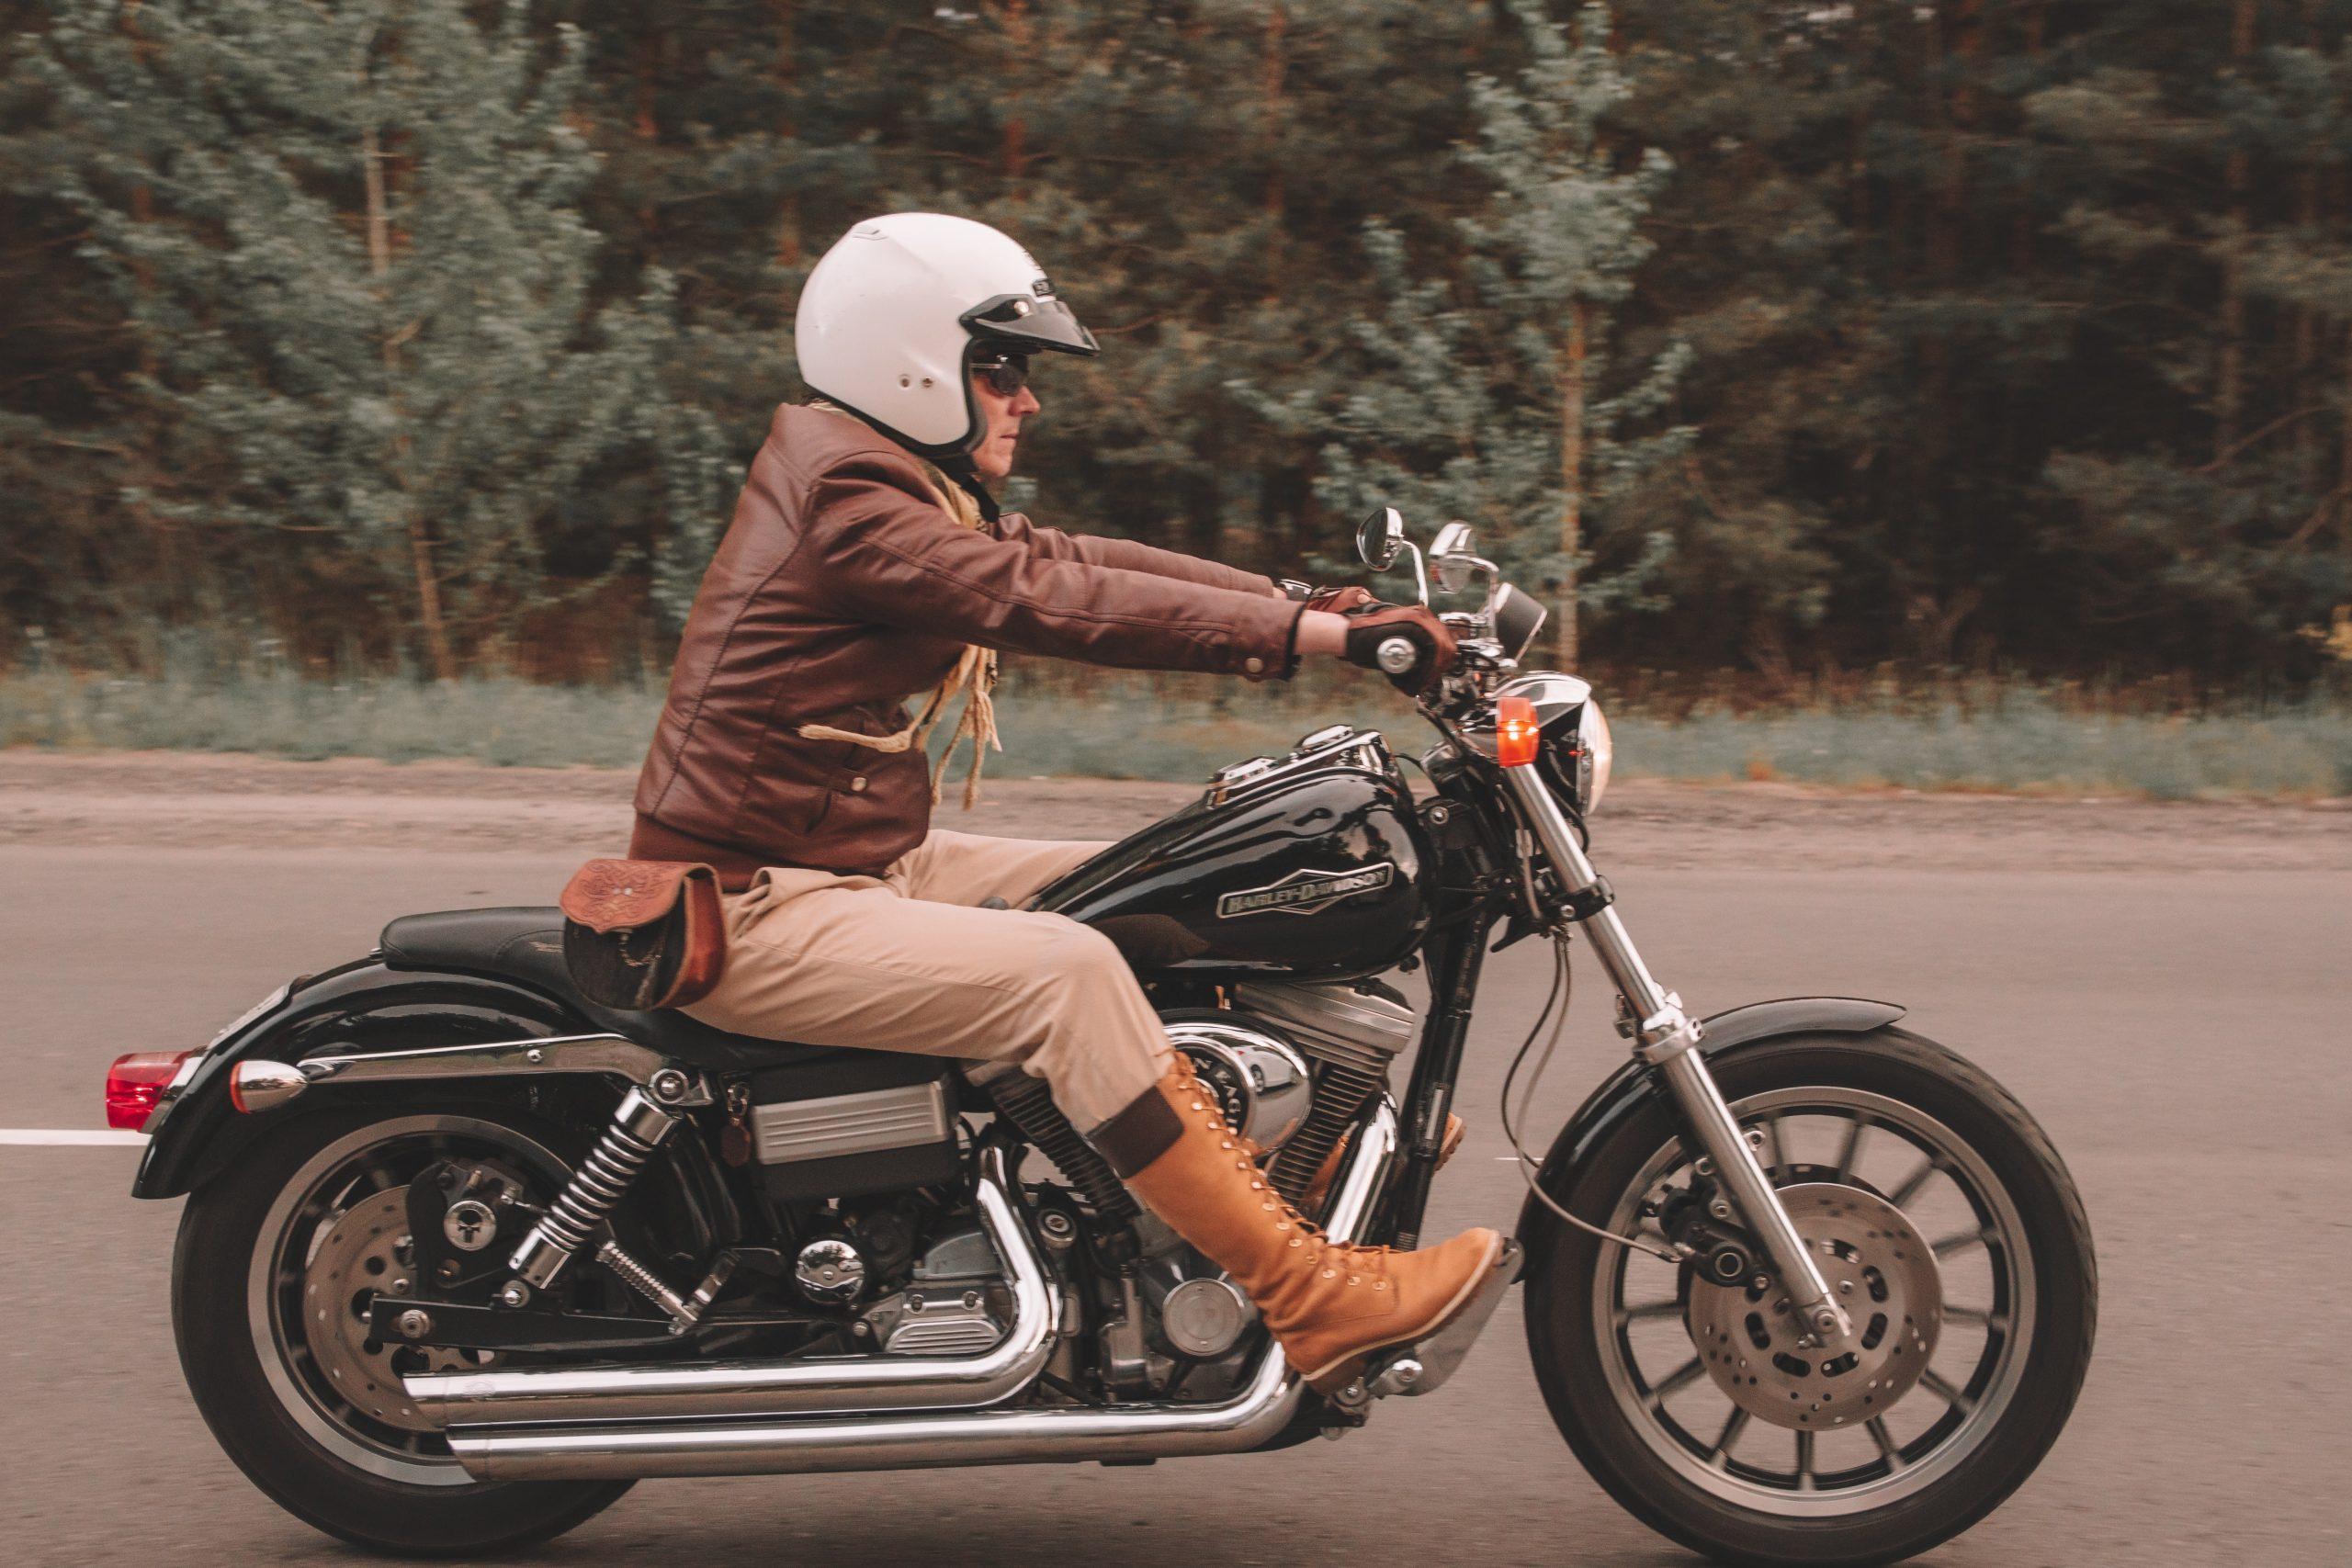 7 datos curiosos que no sabías sobre las motocicletas